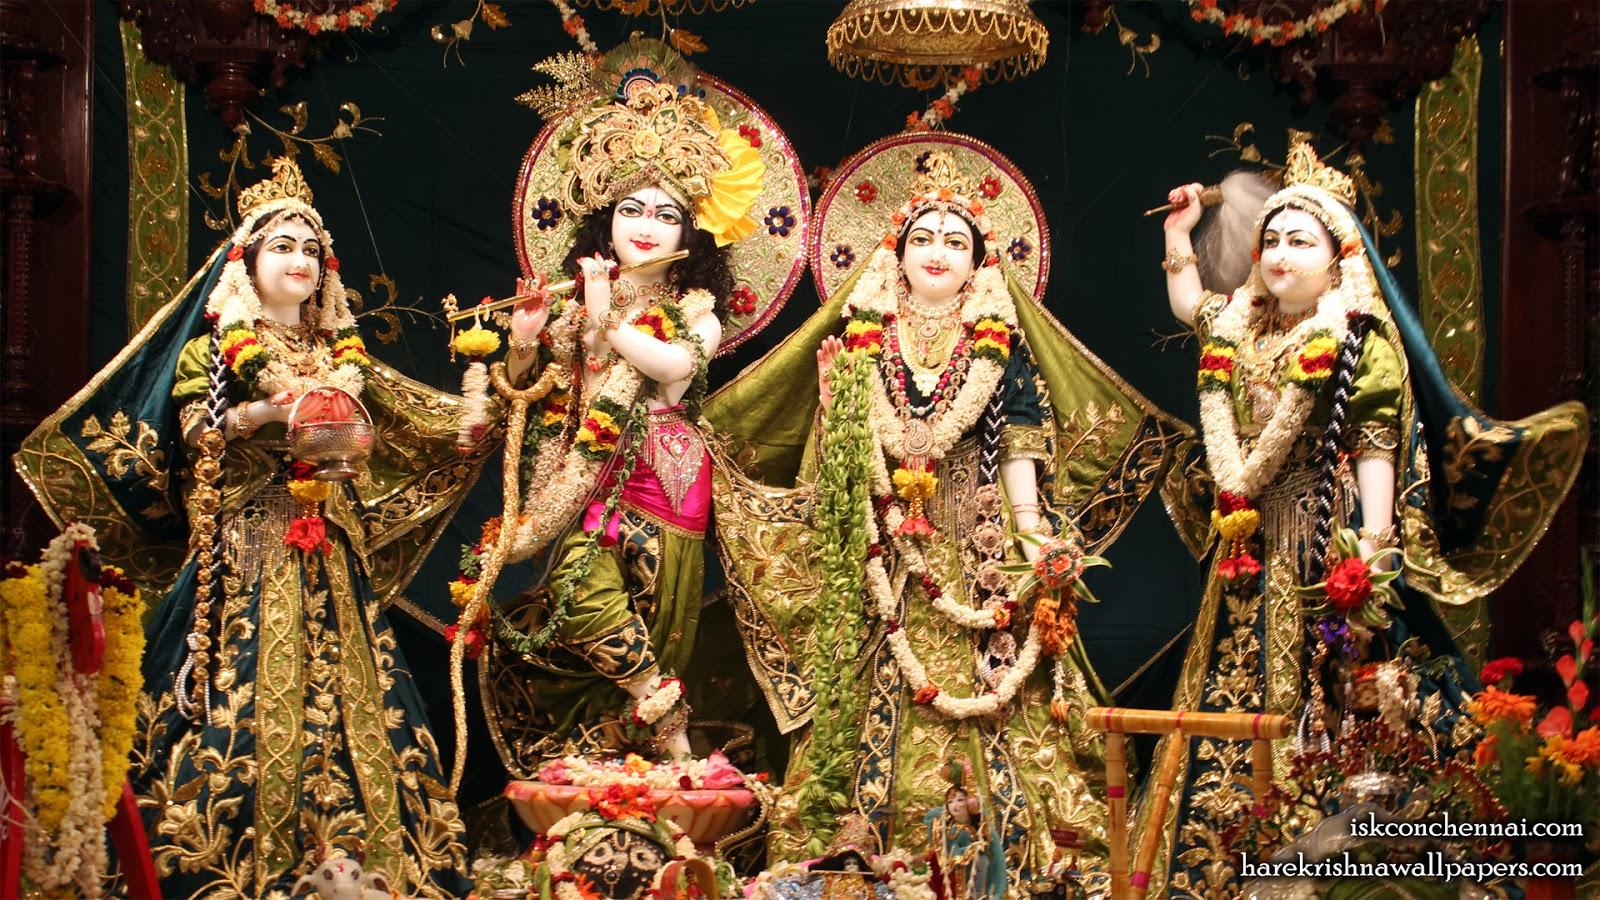 Krishna Radha Love Wallpaper High Definition Hd: Radha Krishna HD Wallpapers